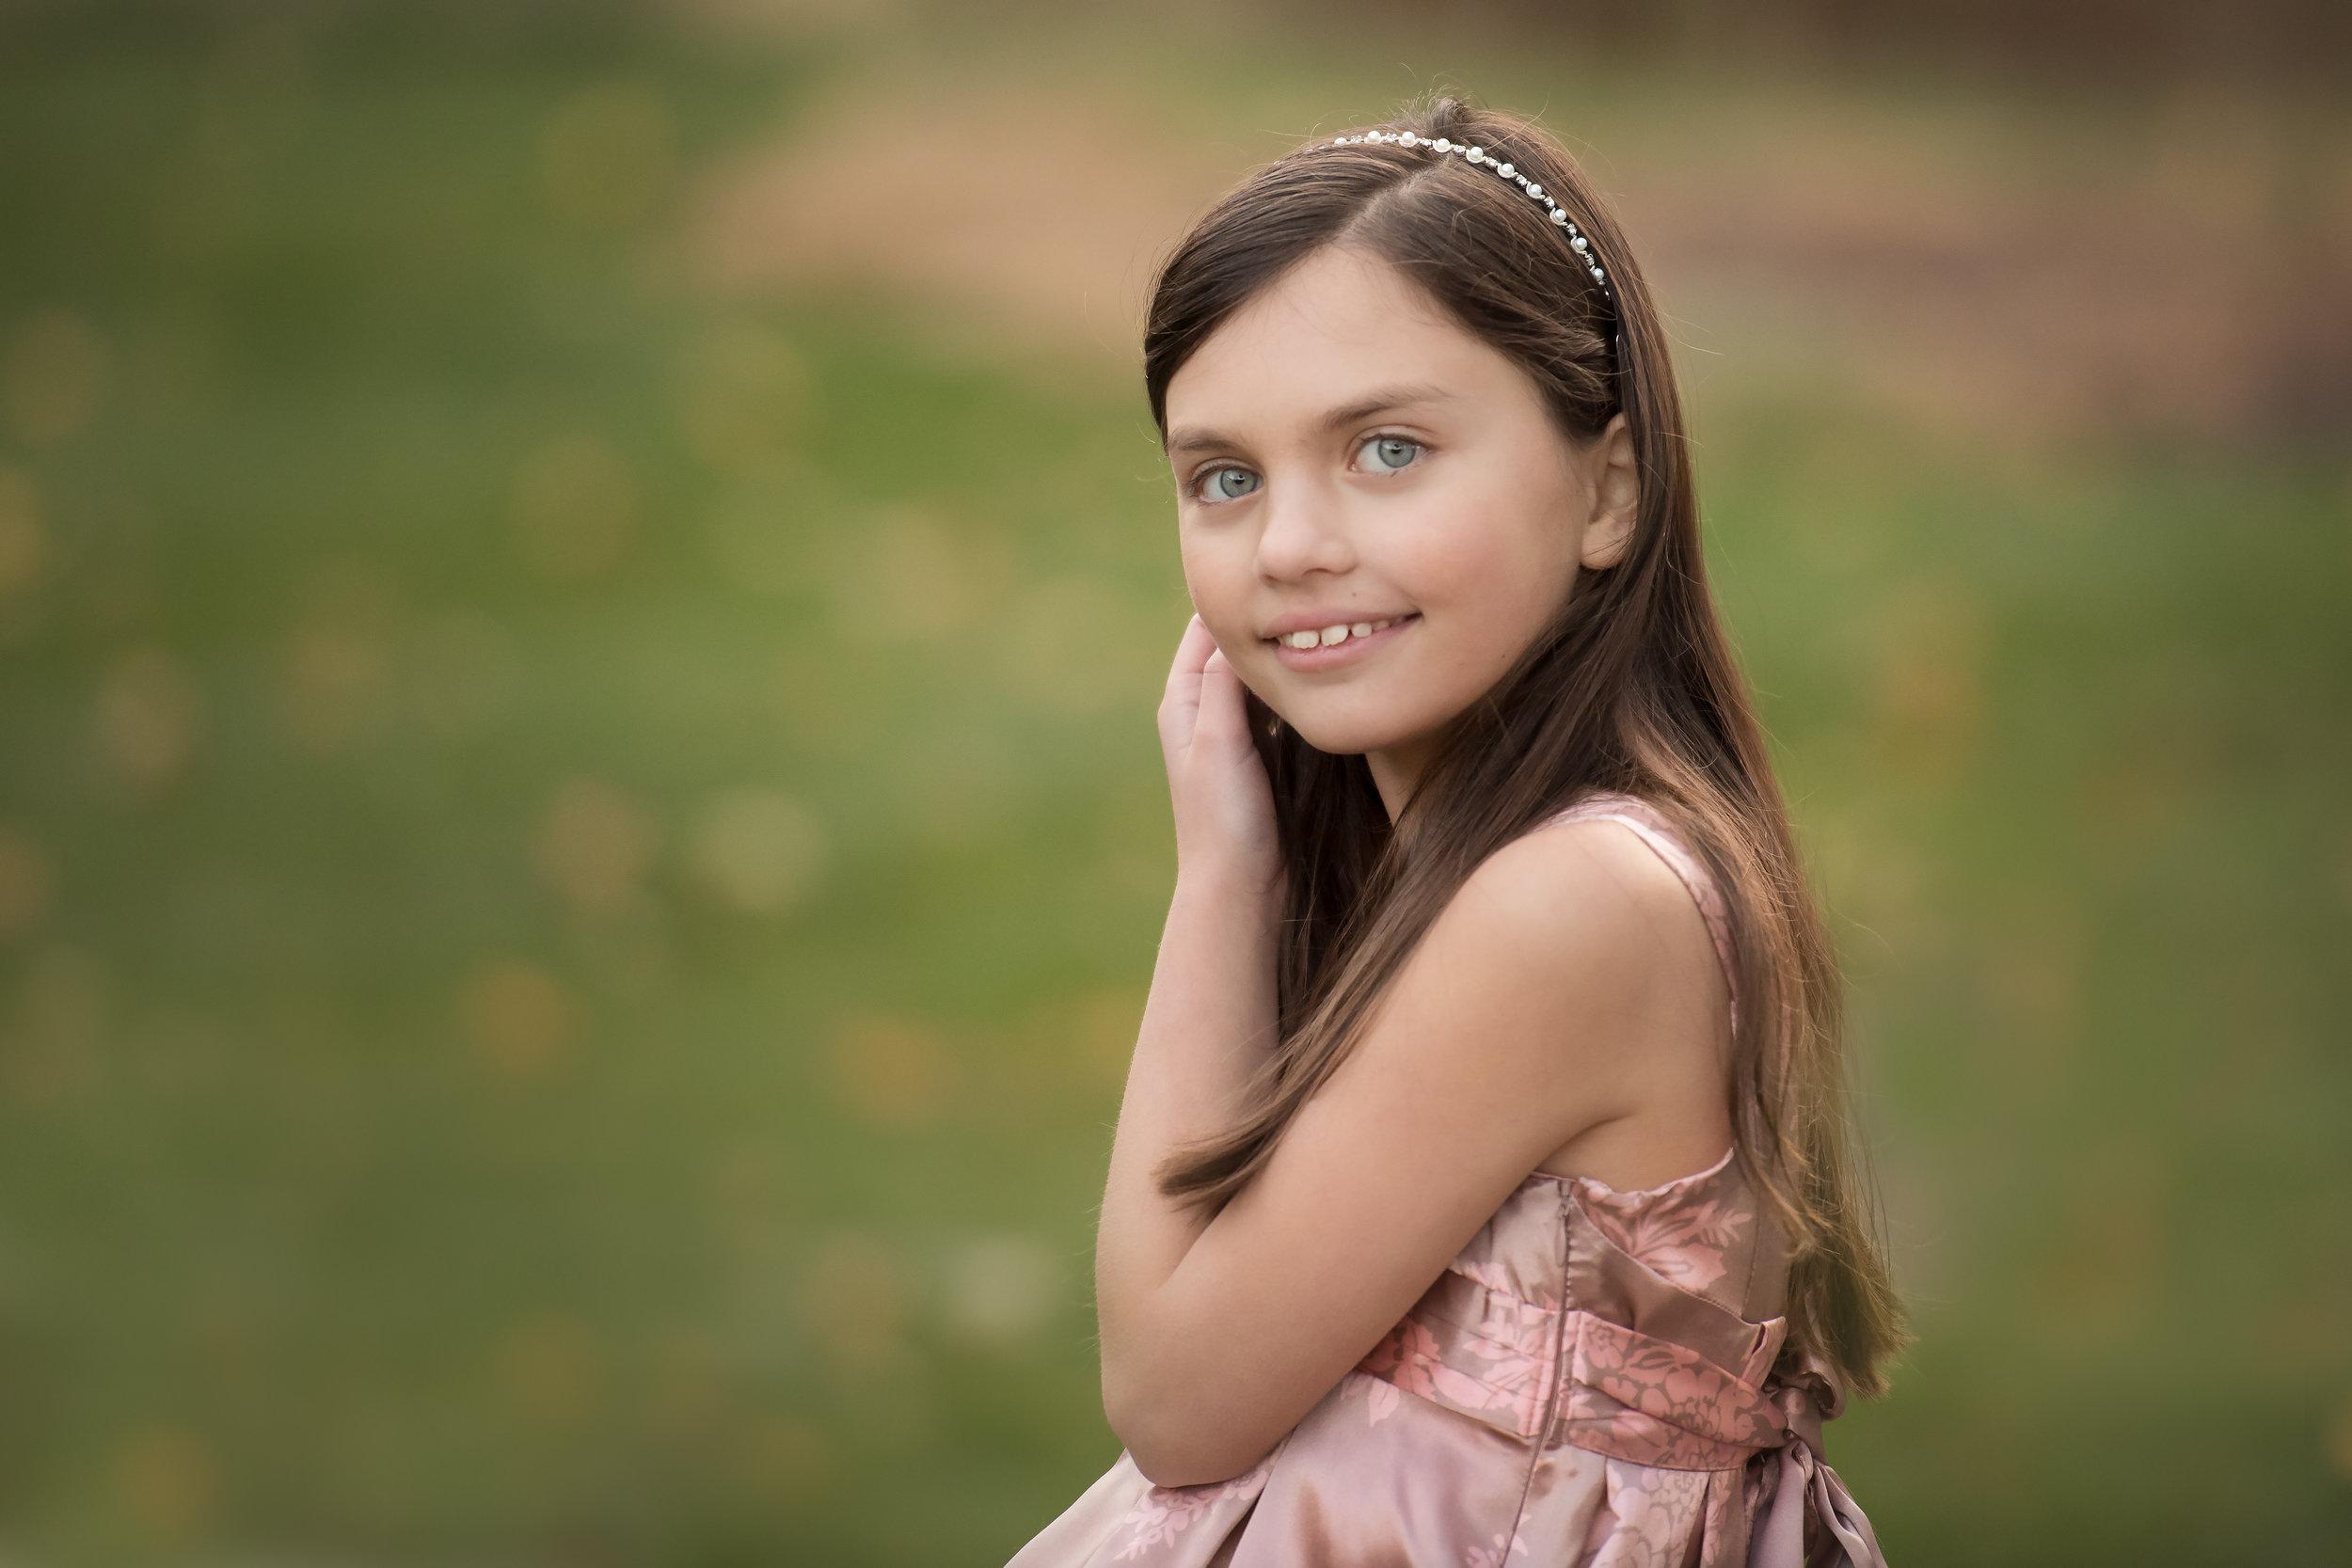 Girl in a Beautiful Dress and Headband